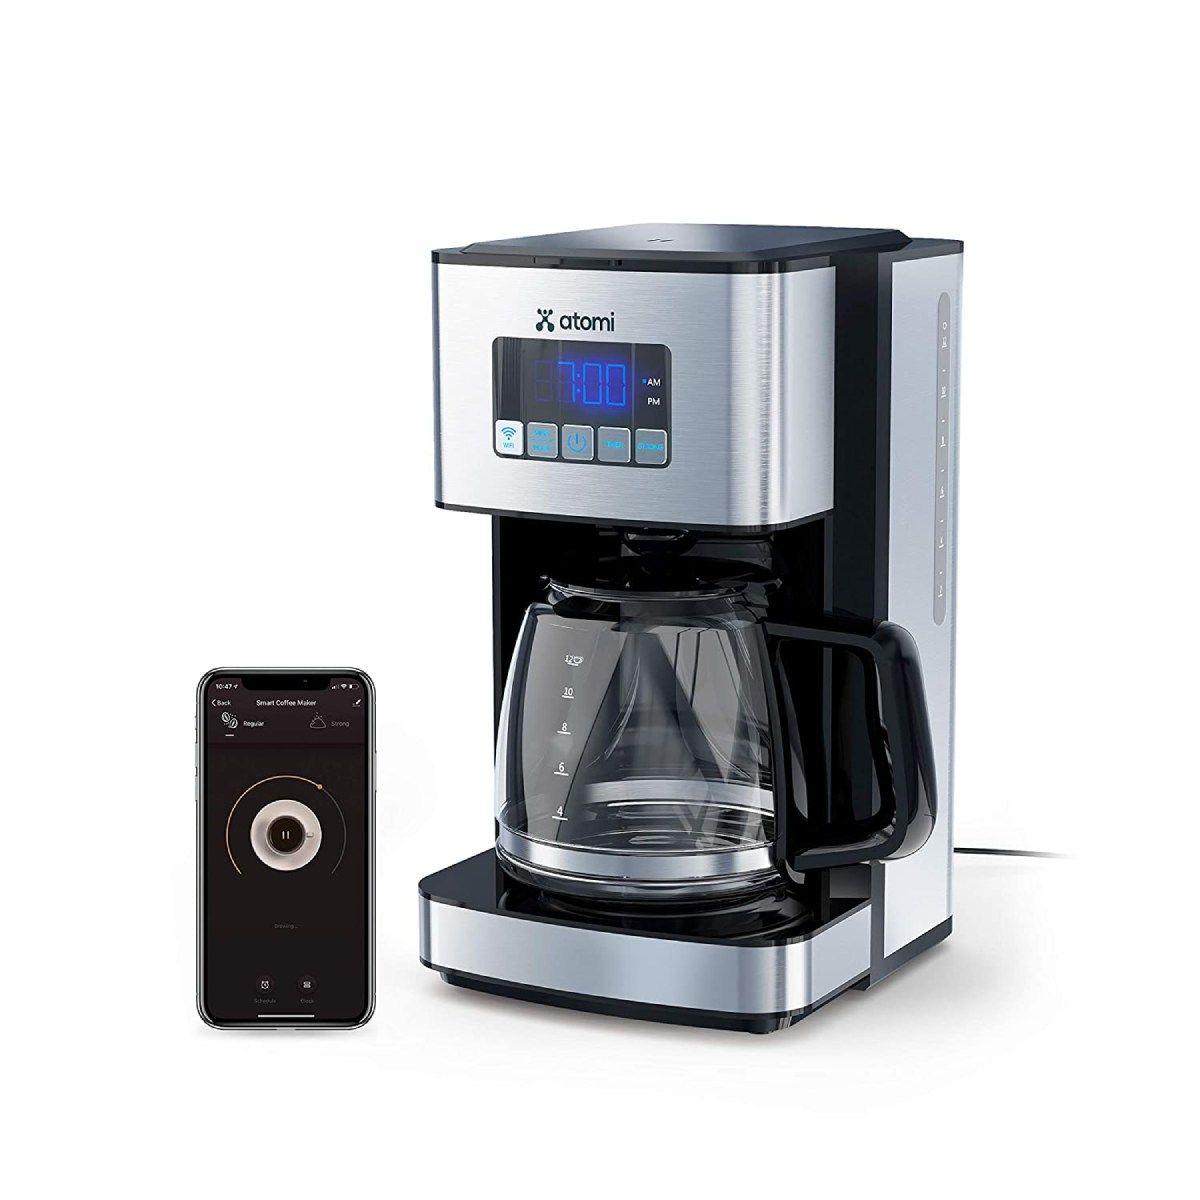 Atomi Smart Wi-Fi Coffee Maker